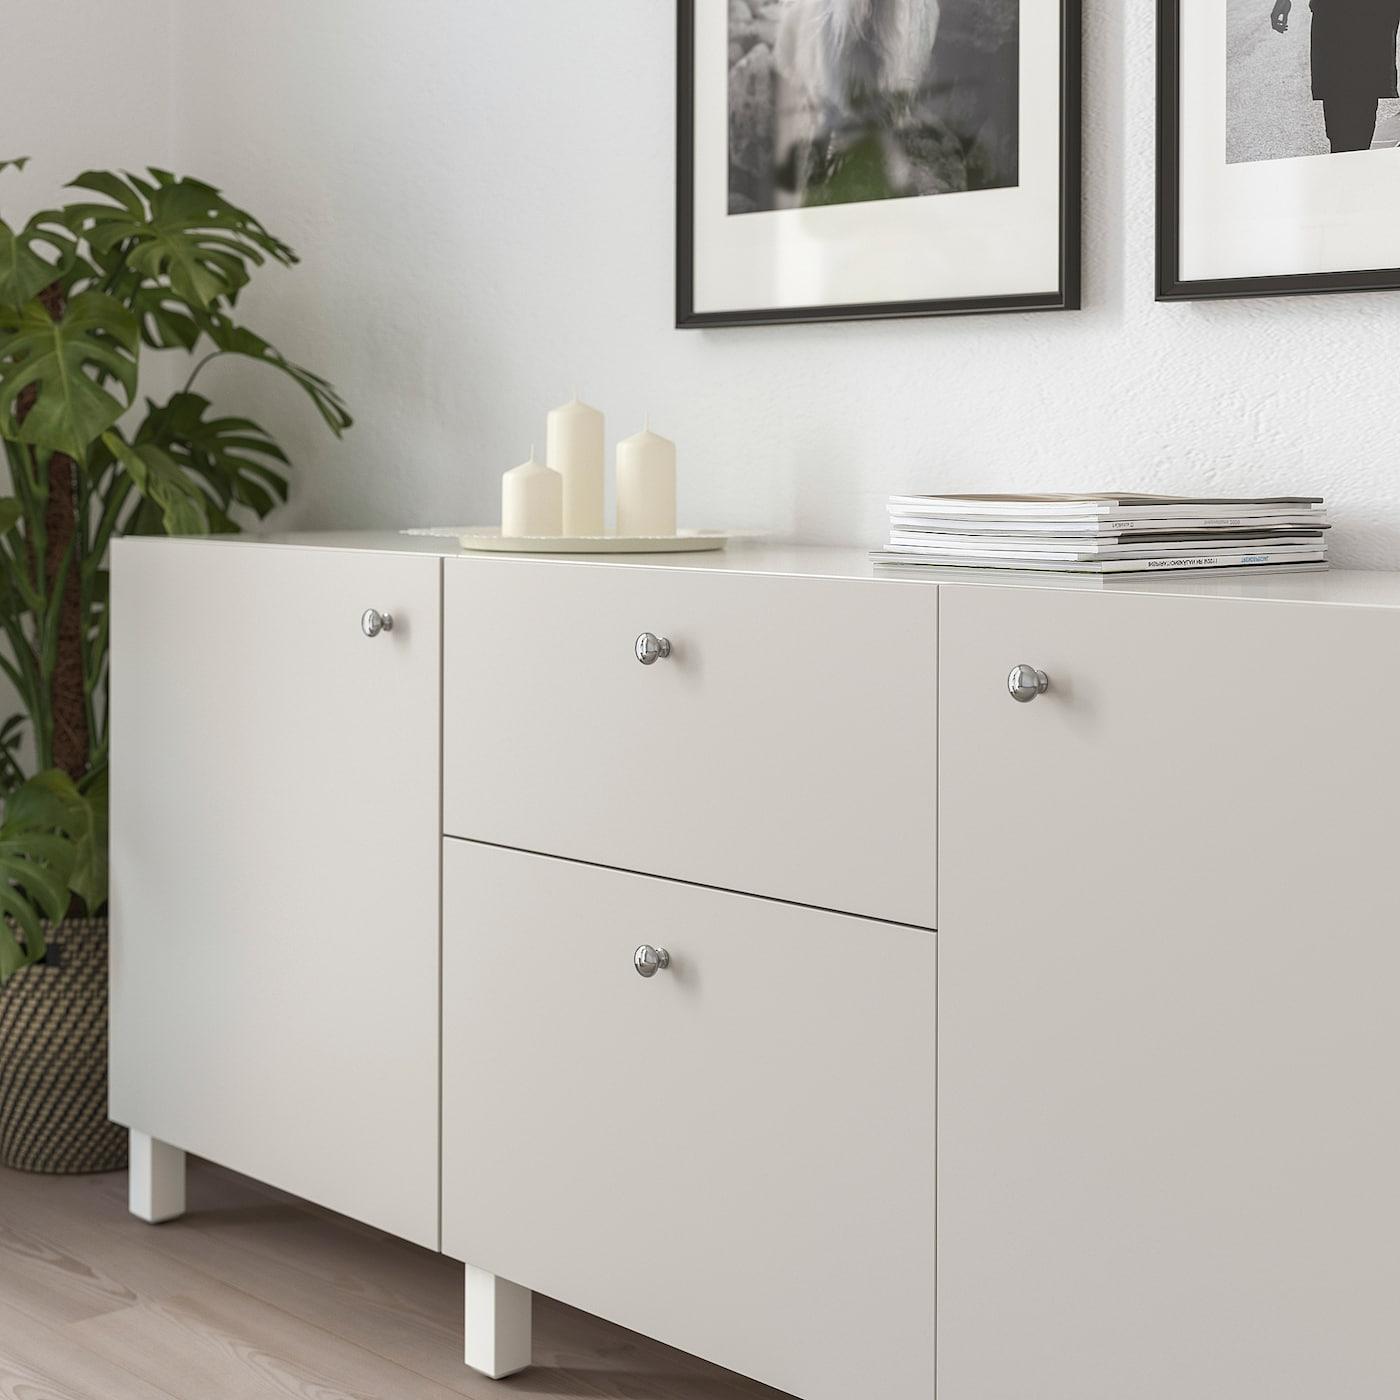 IKEA Oven Cooker Spark Impluse Generator B200056-00 GENUINE